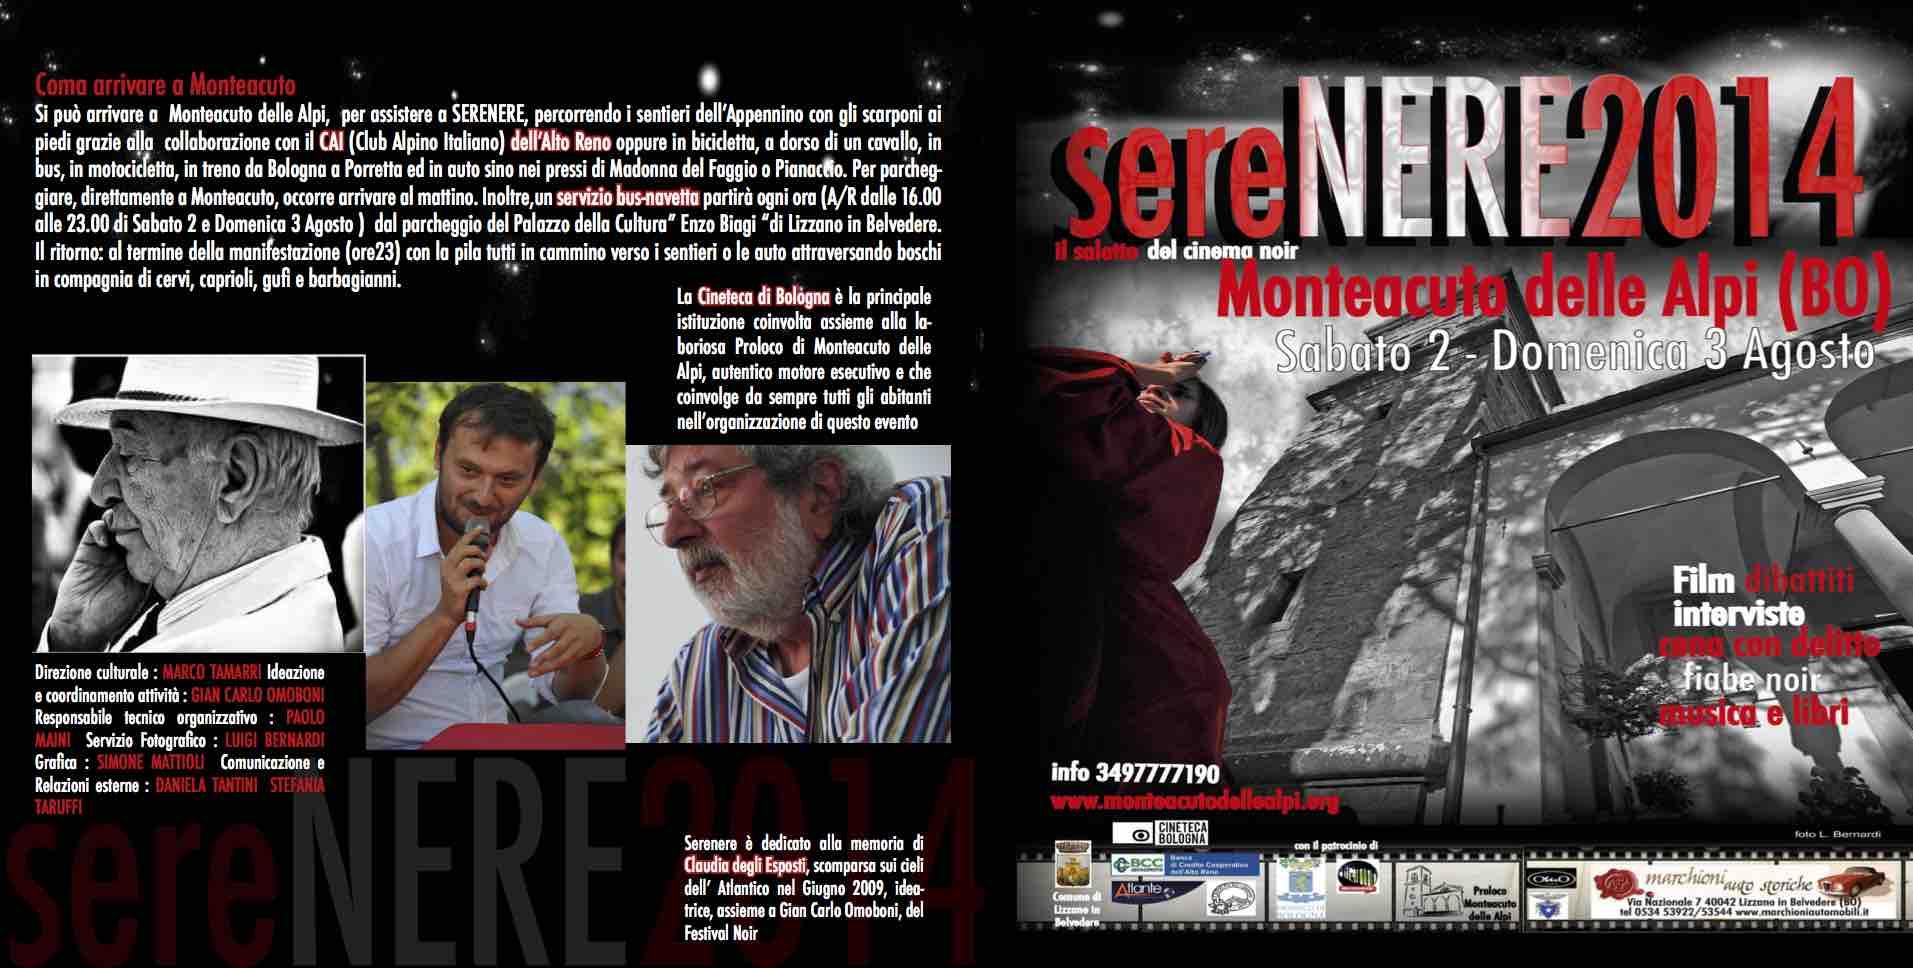 serenere-2014